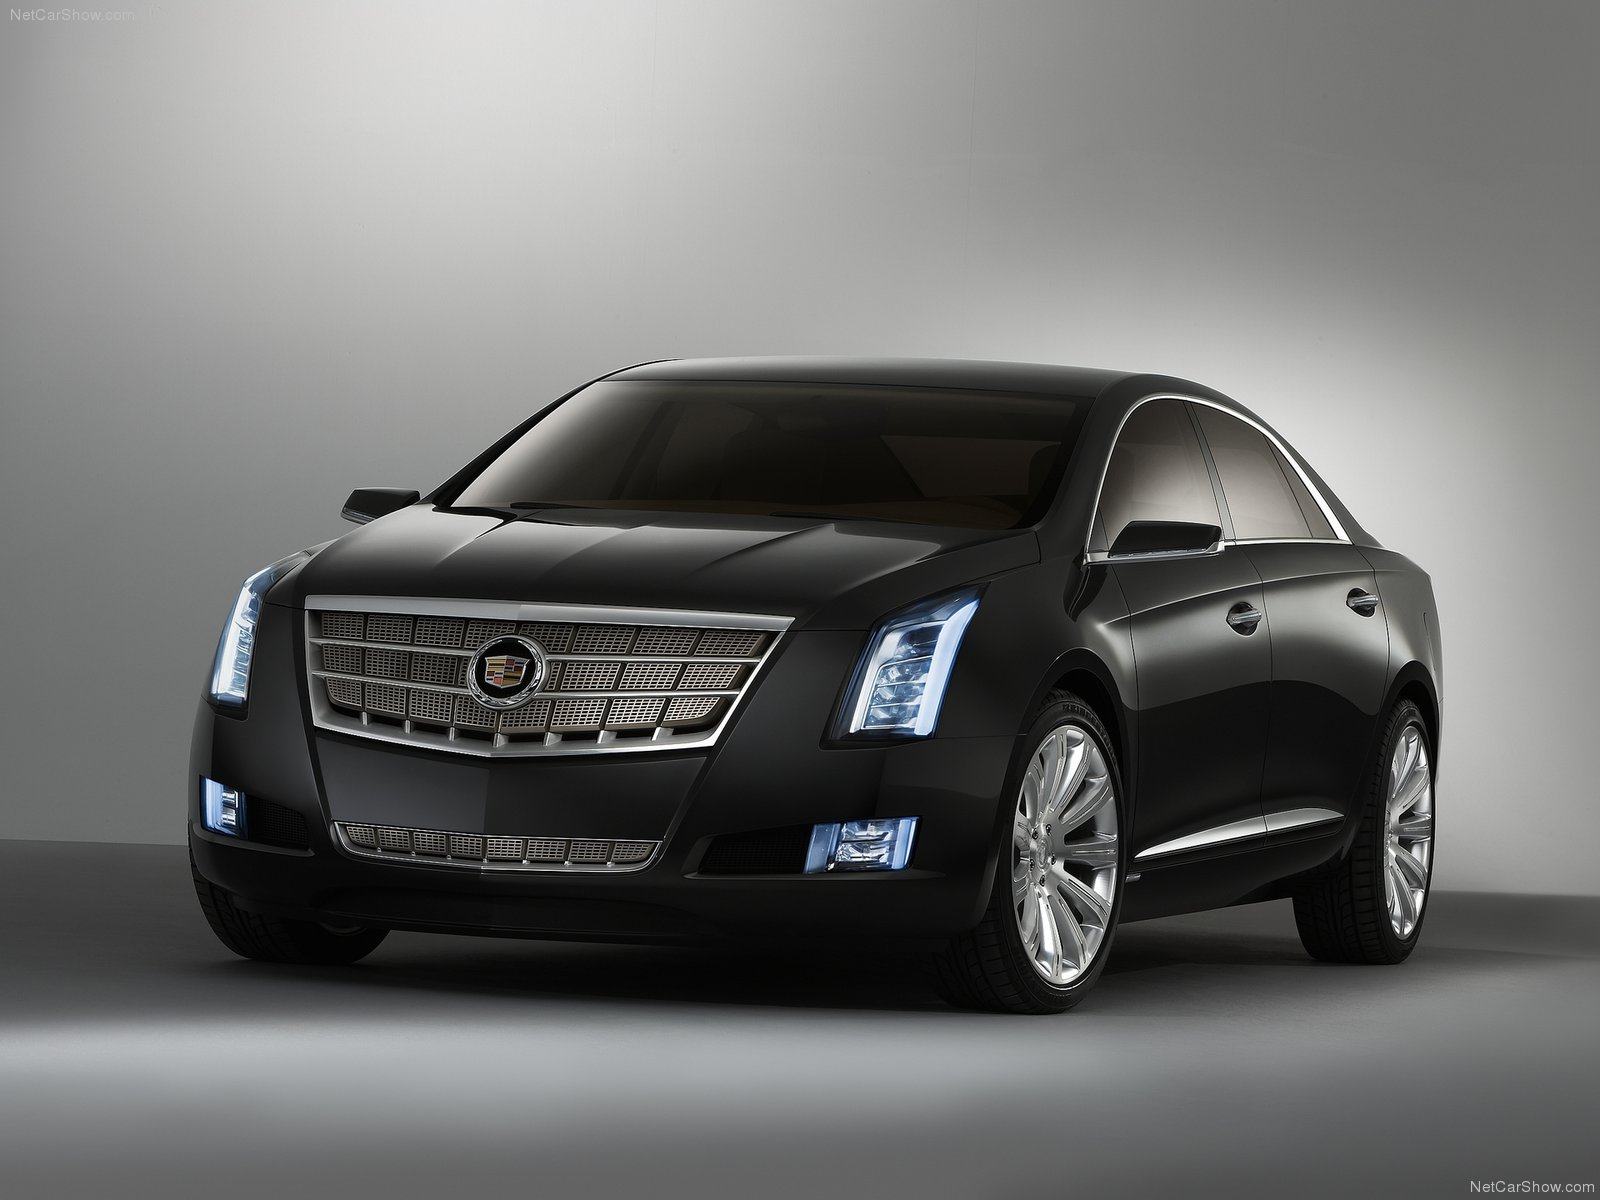 Cars Liry: Cadillac XTS Platinum Concept (2010)